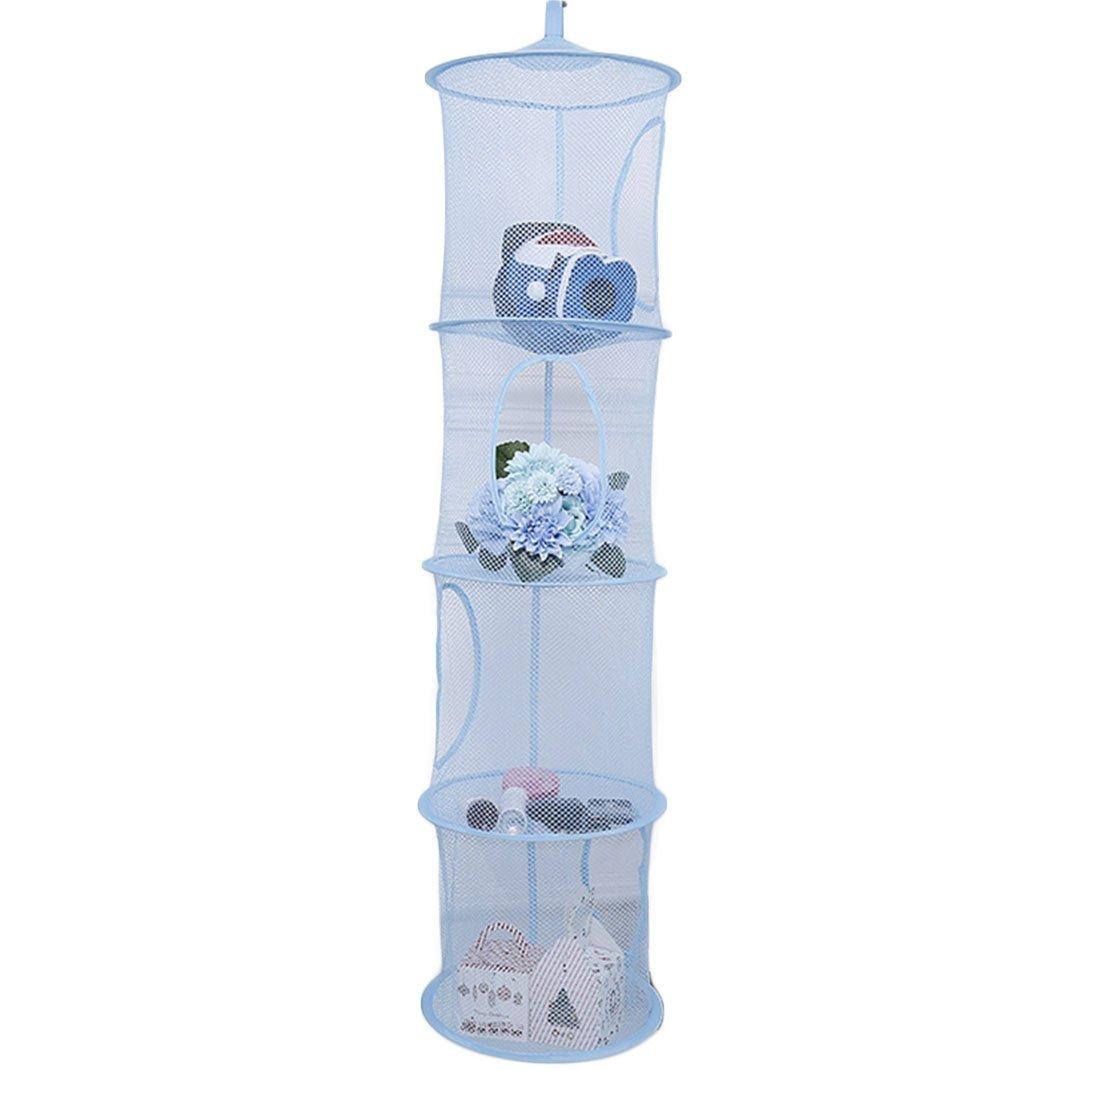 mingcheng 4 Tier Foldable Hanging Basket Cloth Mesh Toy Storage Net Bag - Blue